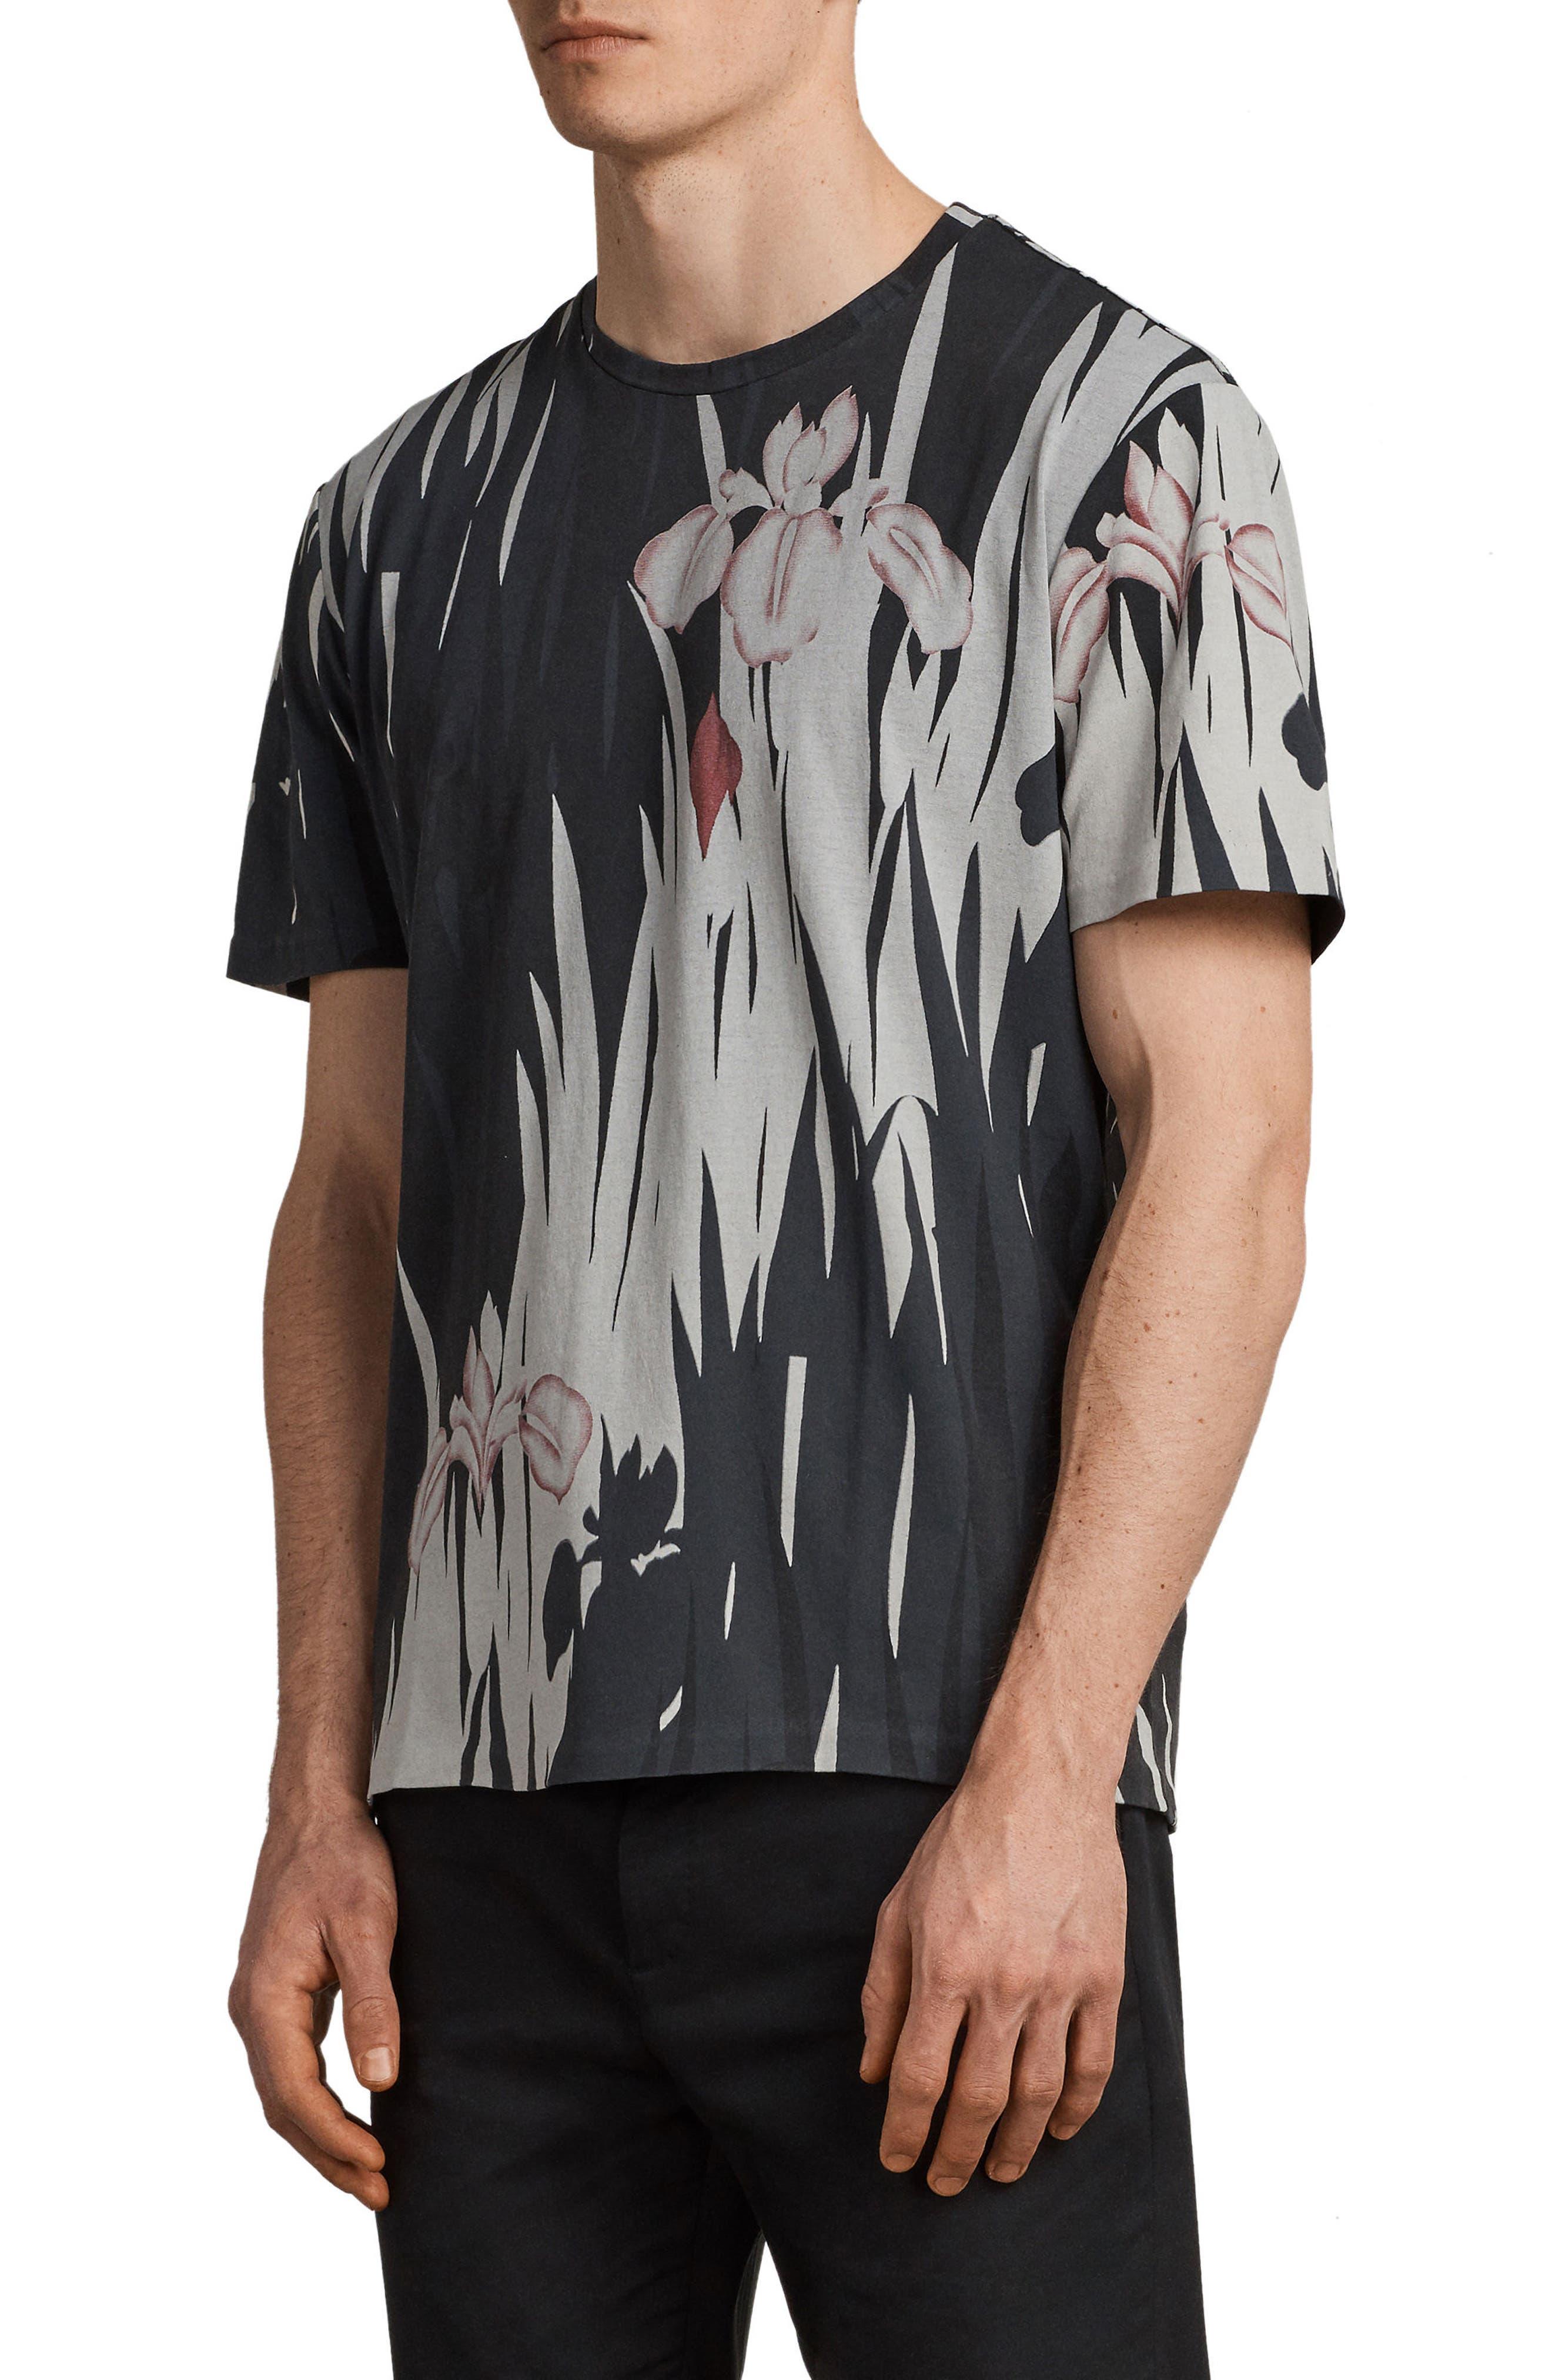 Nahiku Oversized Crewneck T-shirt,                             Alternate thumbnail 3, color,                             004